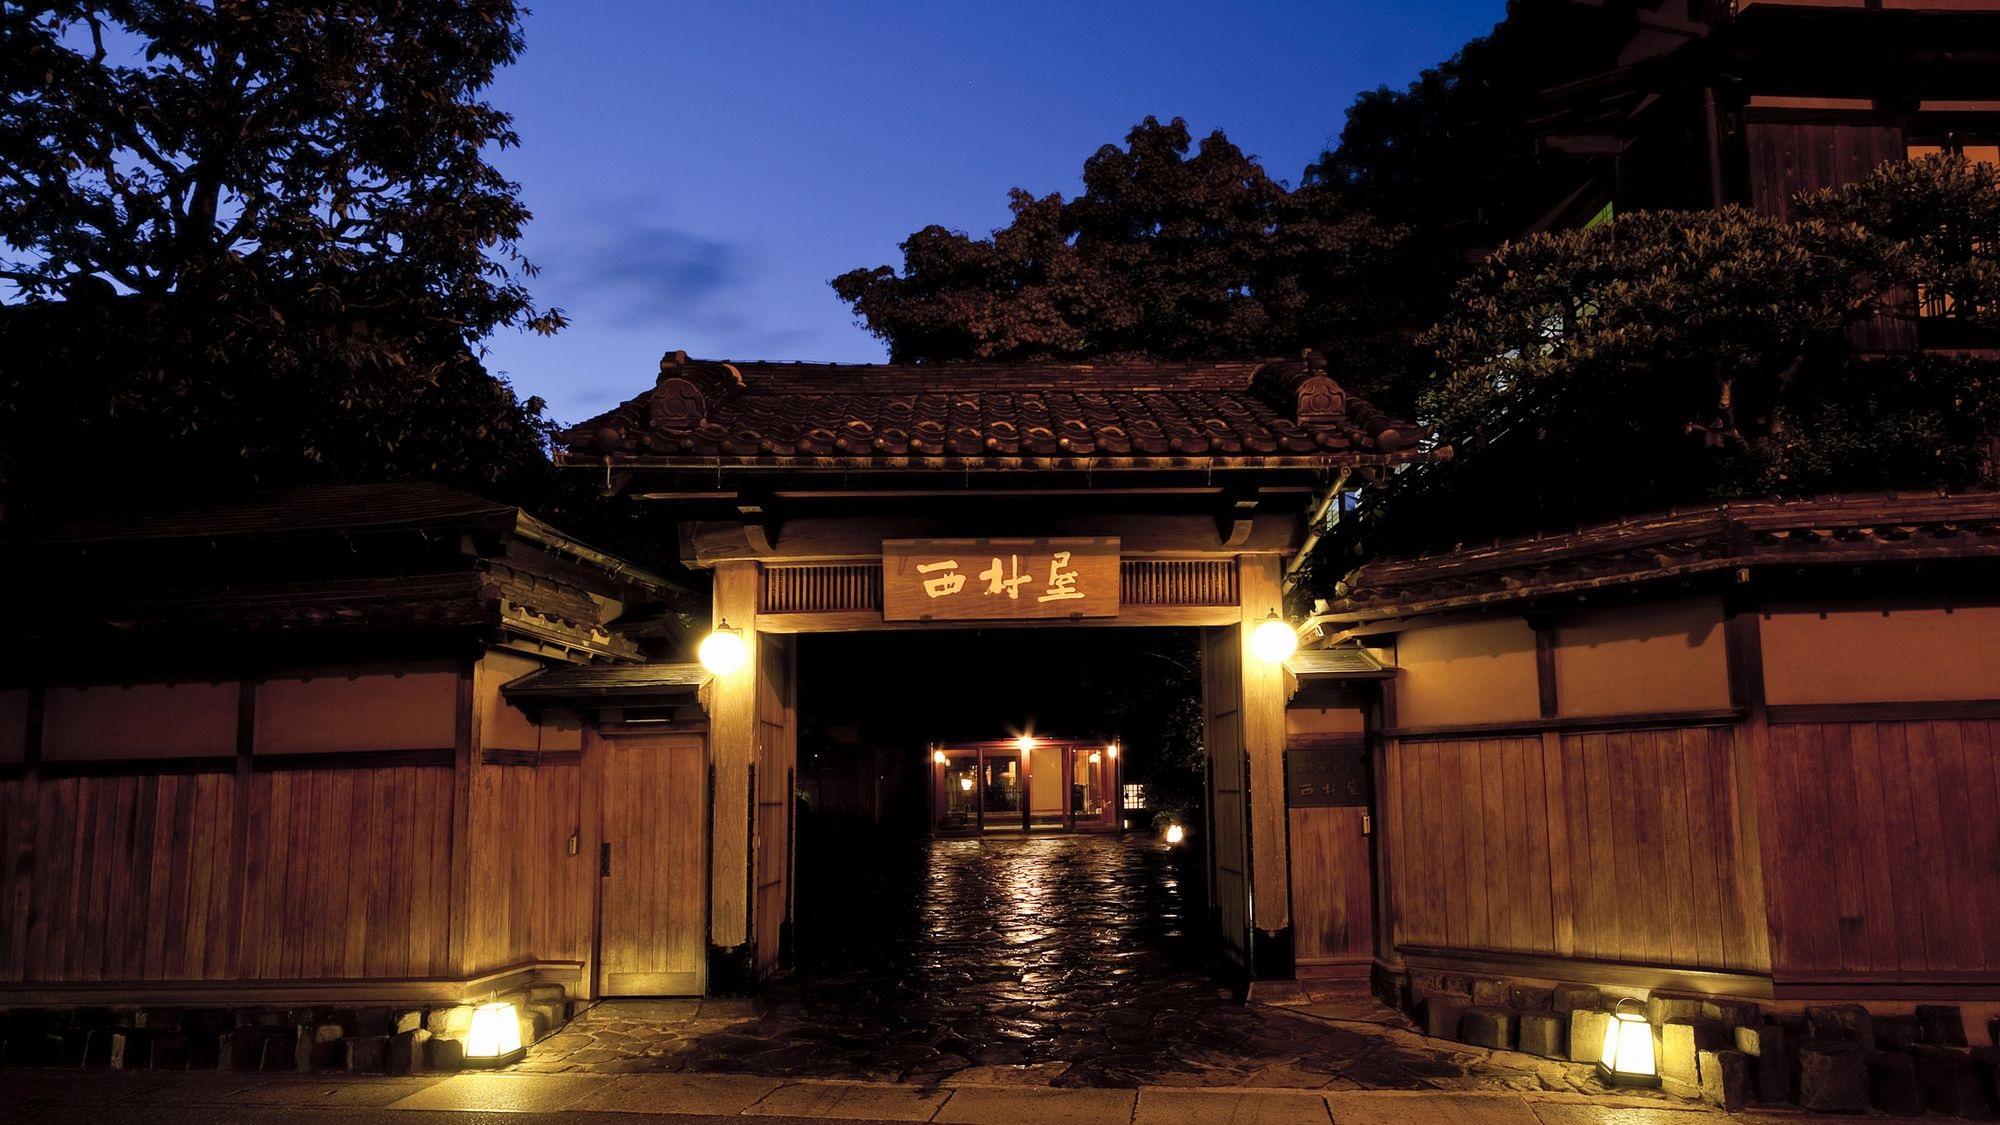 関西の高級温泉旅館